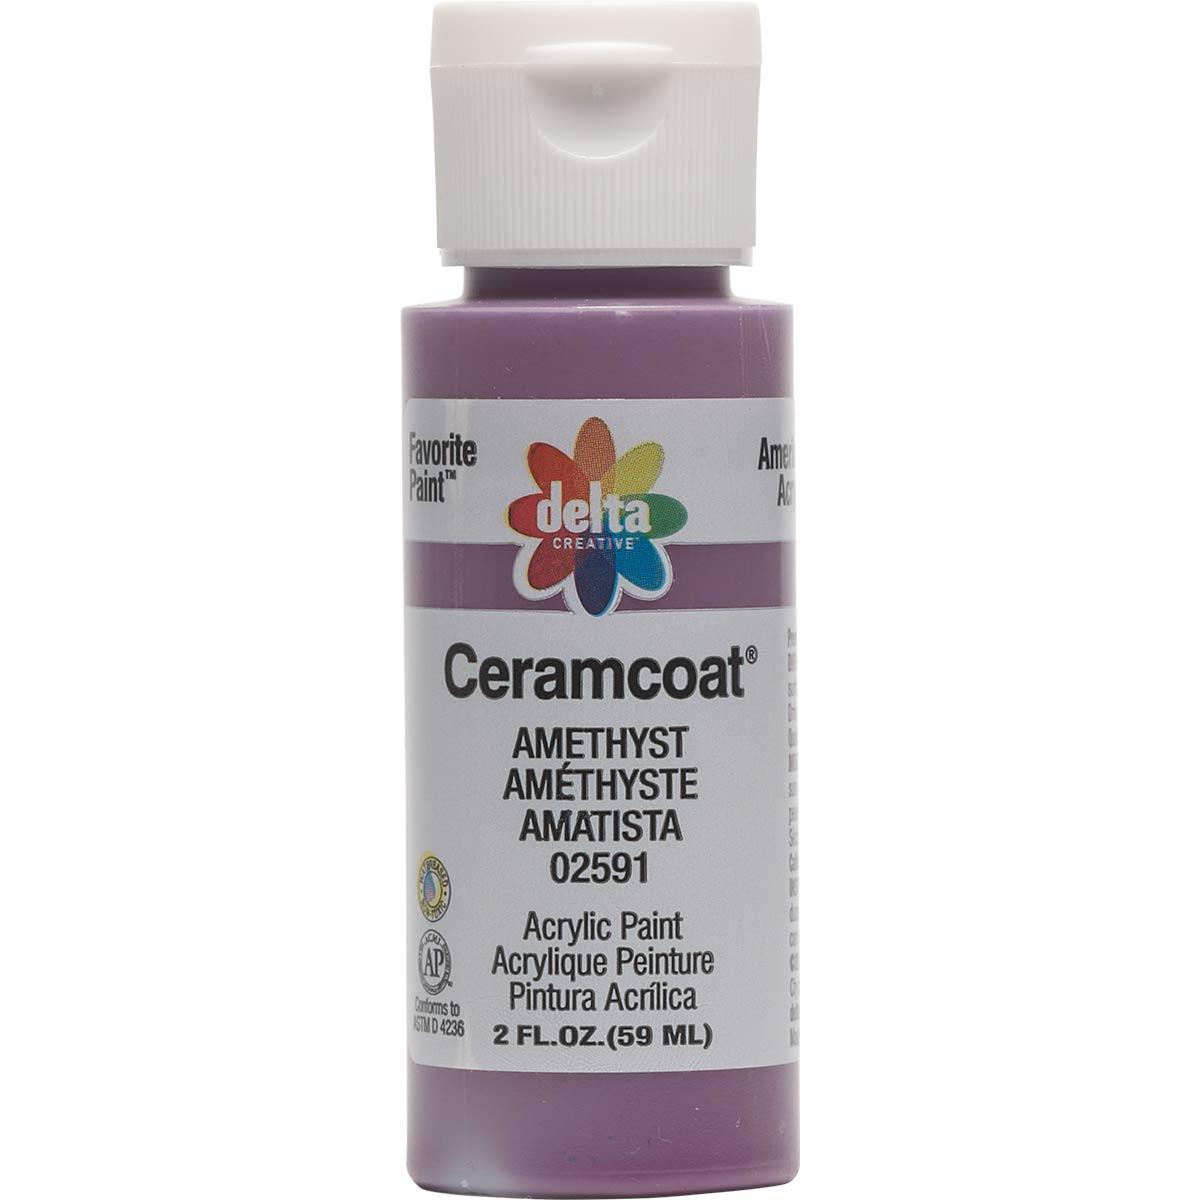 Delta Ceramcoat ® Acrylic Paint - Amethyst, 2 oz.